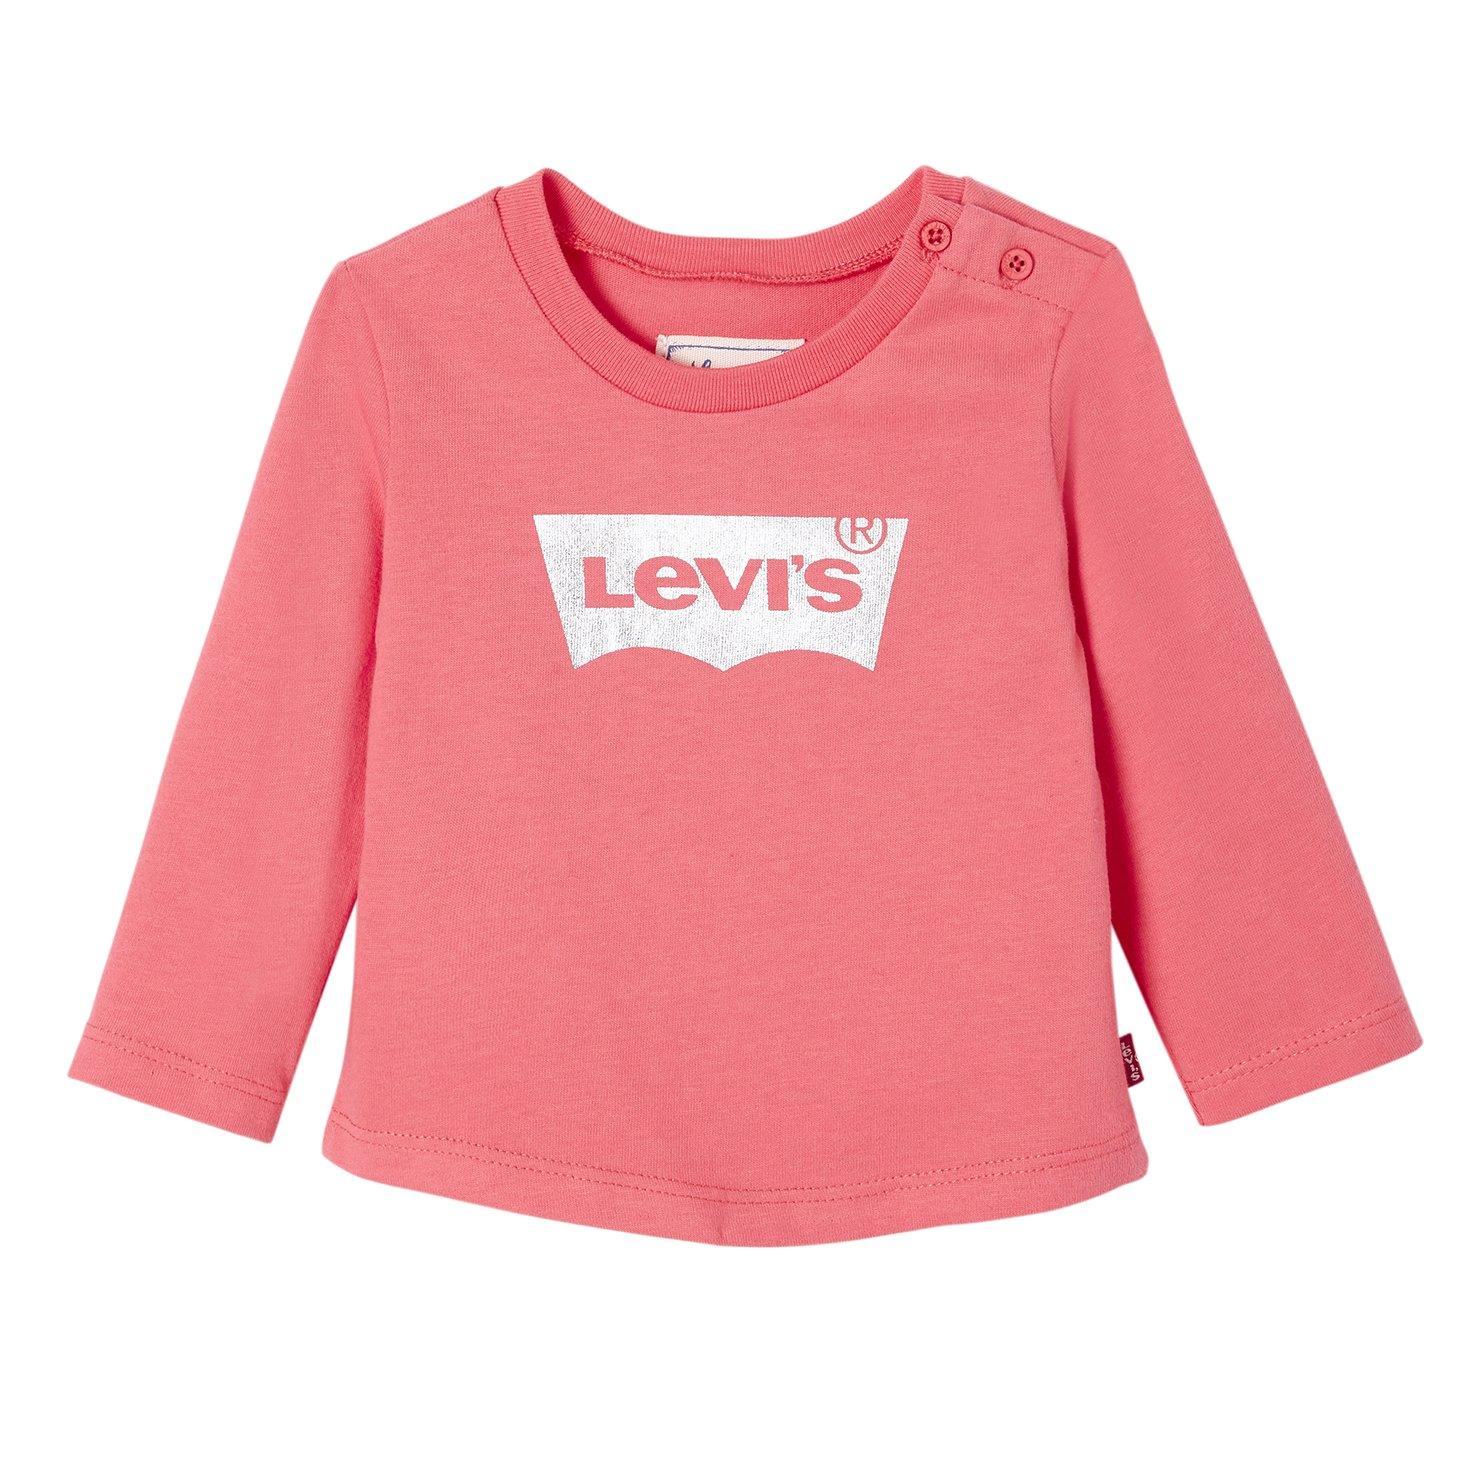 Levi's Kids Baby Girls' T-Shirt Levi' s Kids TEE-SHIRT